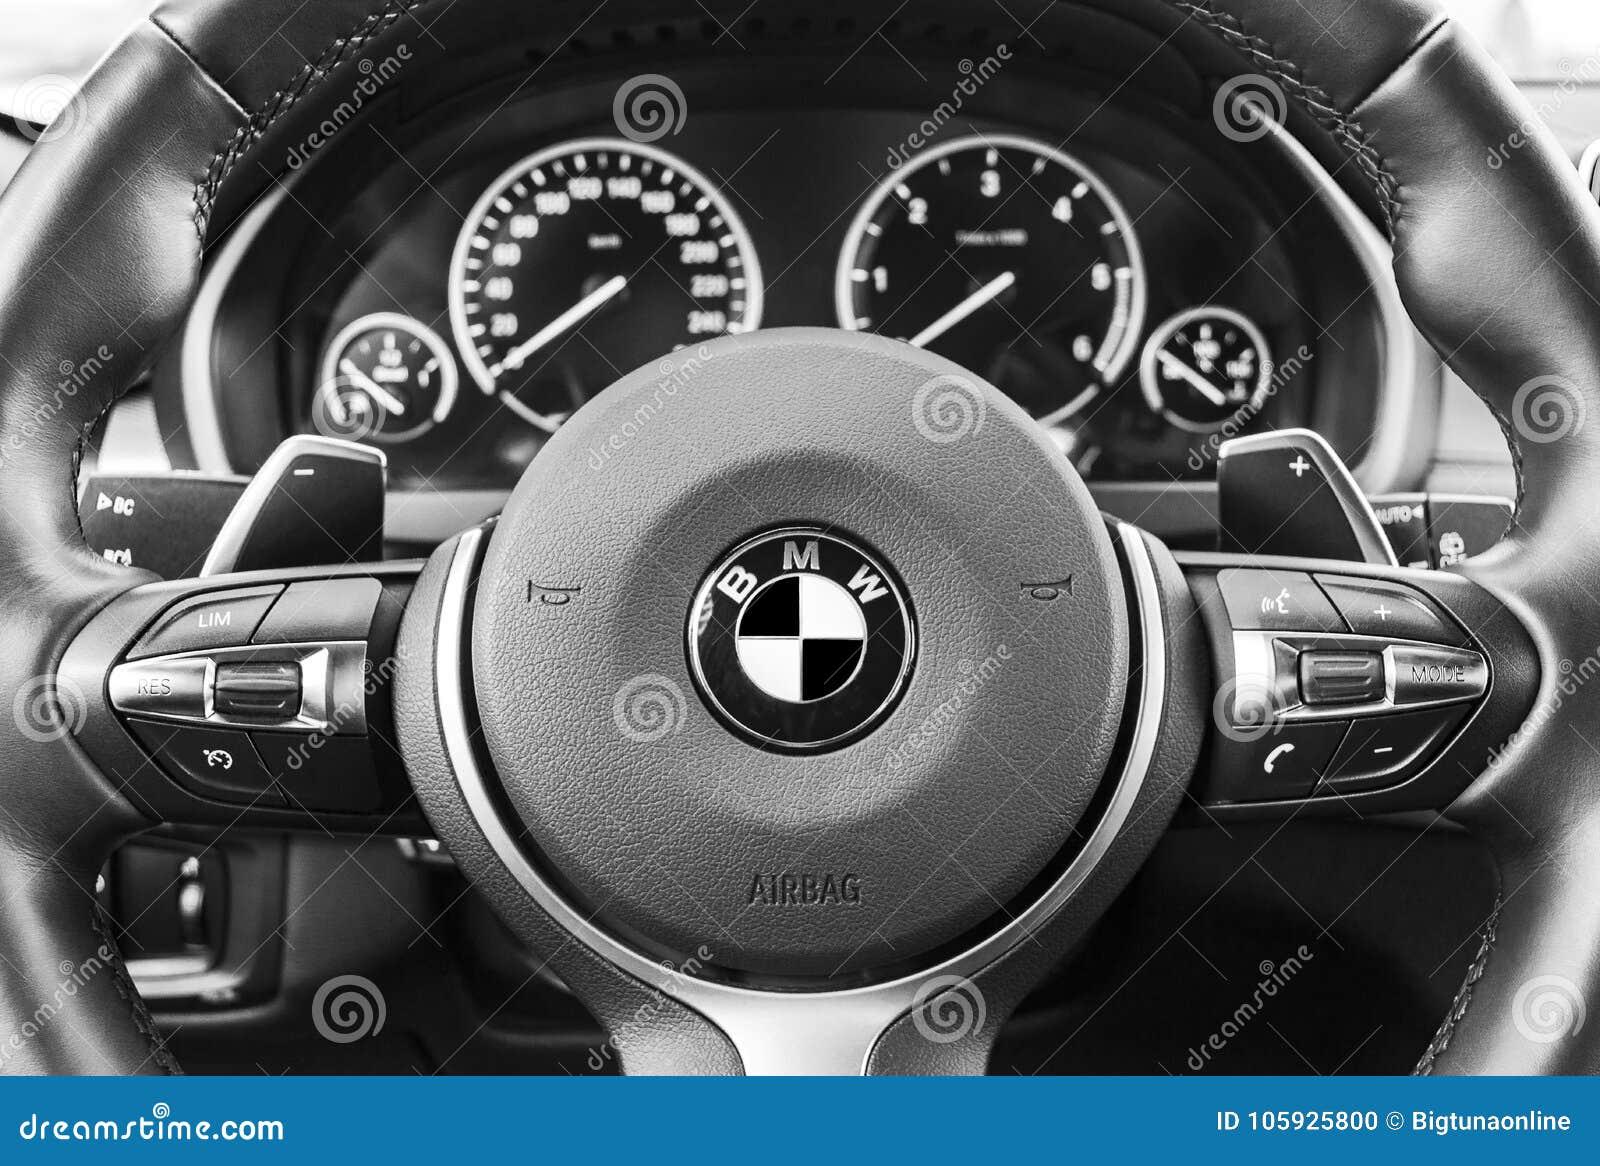 Bmw X5m 2017 Close Up Of Steering Wheel Dashboard Modern Car